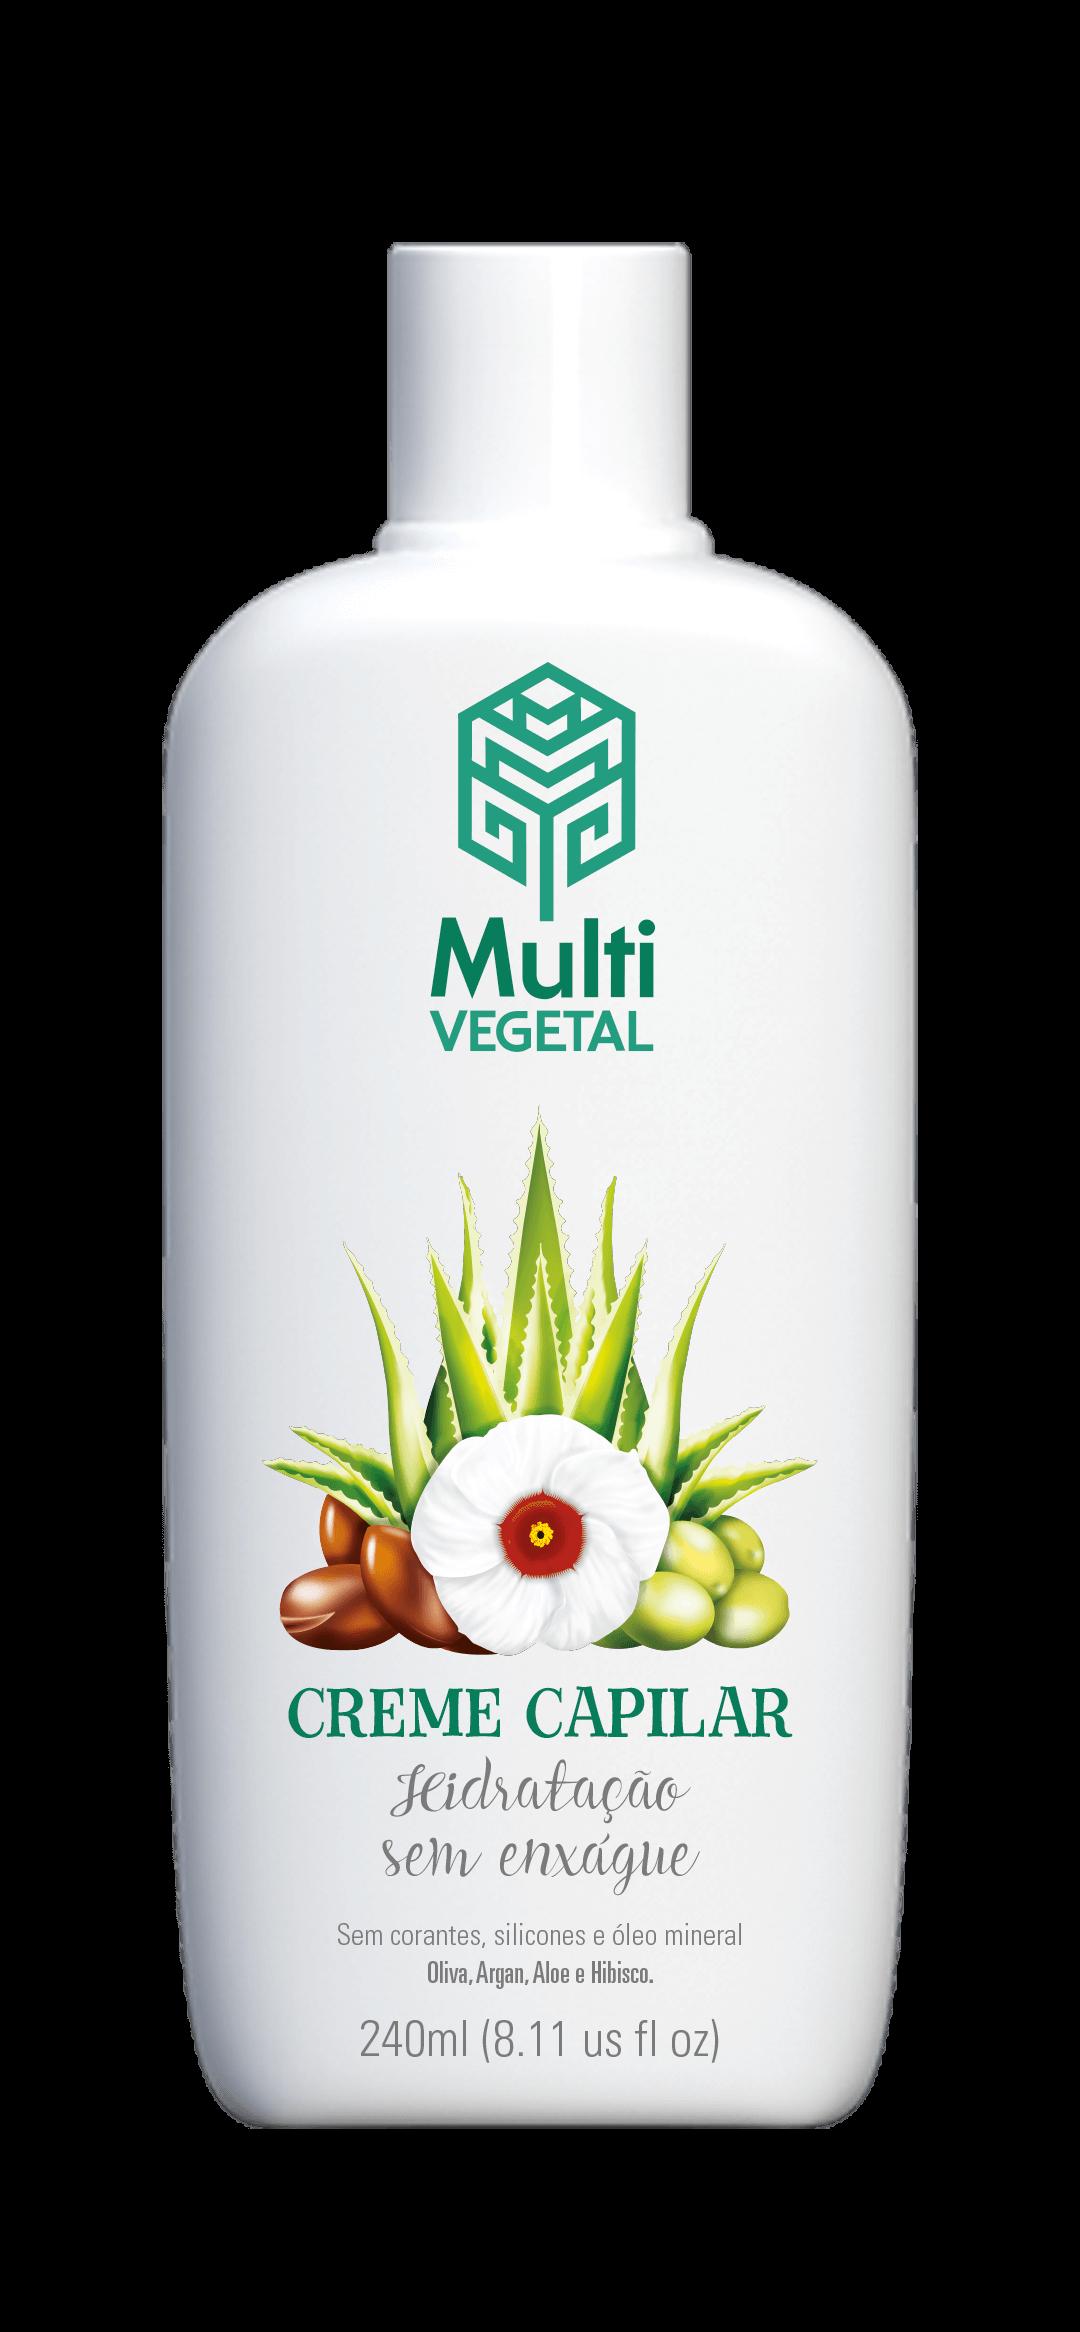 Creme Capilar de Oliva com Argan, Aloe e Hibisco 240ml